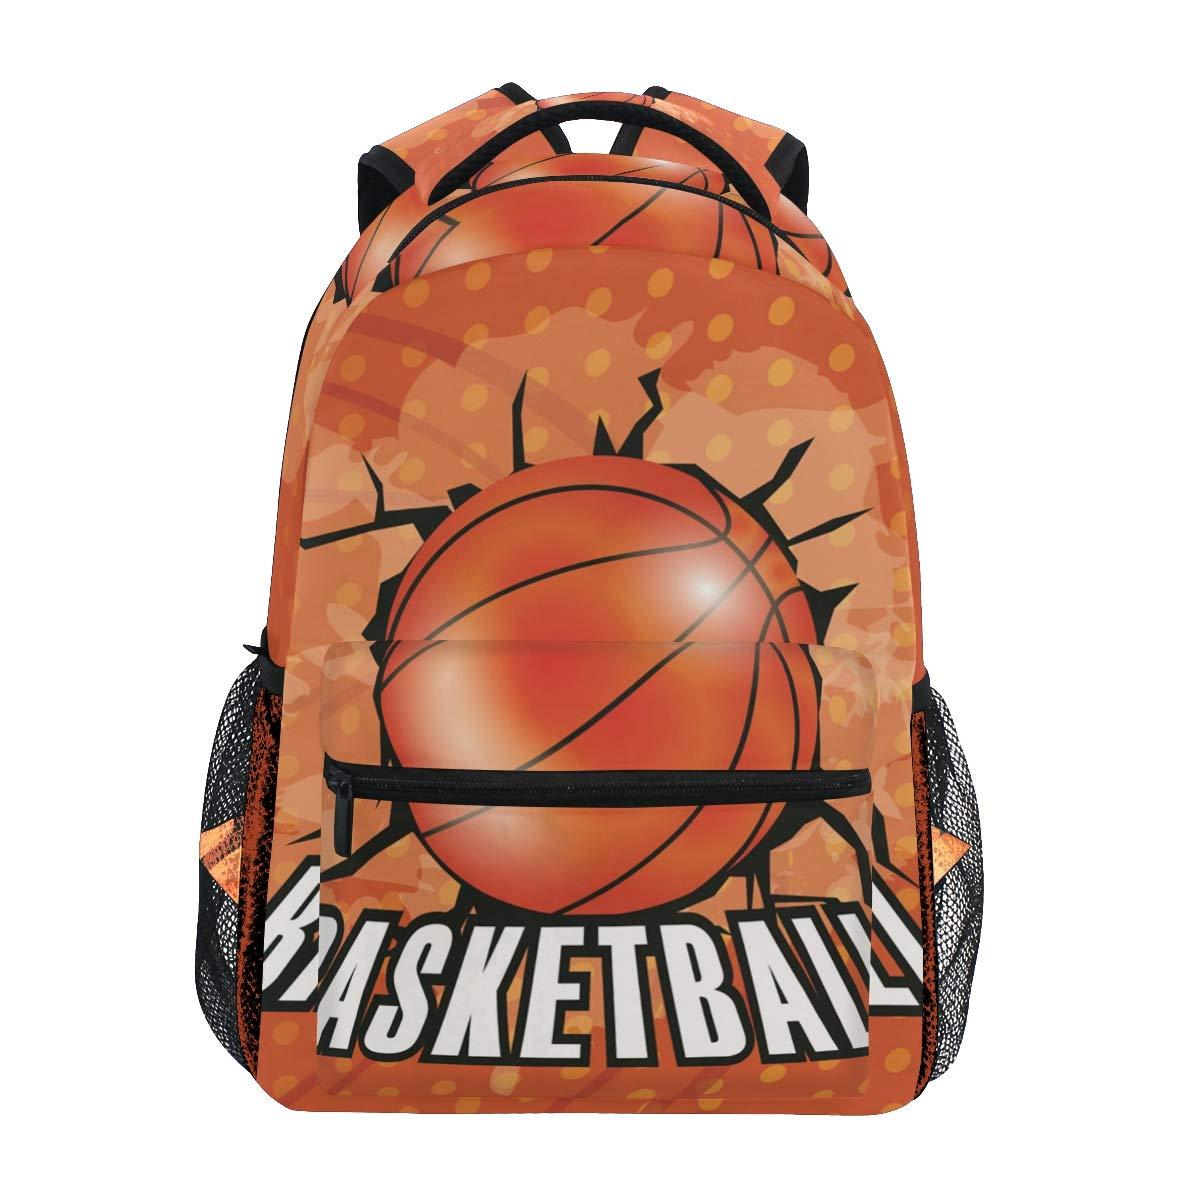 Baloncesto De Arte Naranja Mochila Escolar Impermeable Mochilas ...